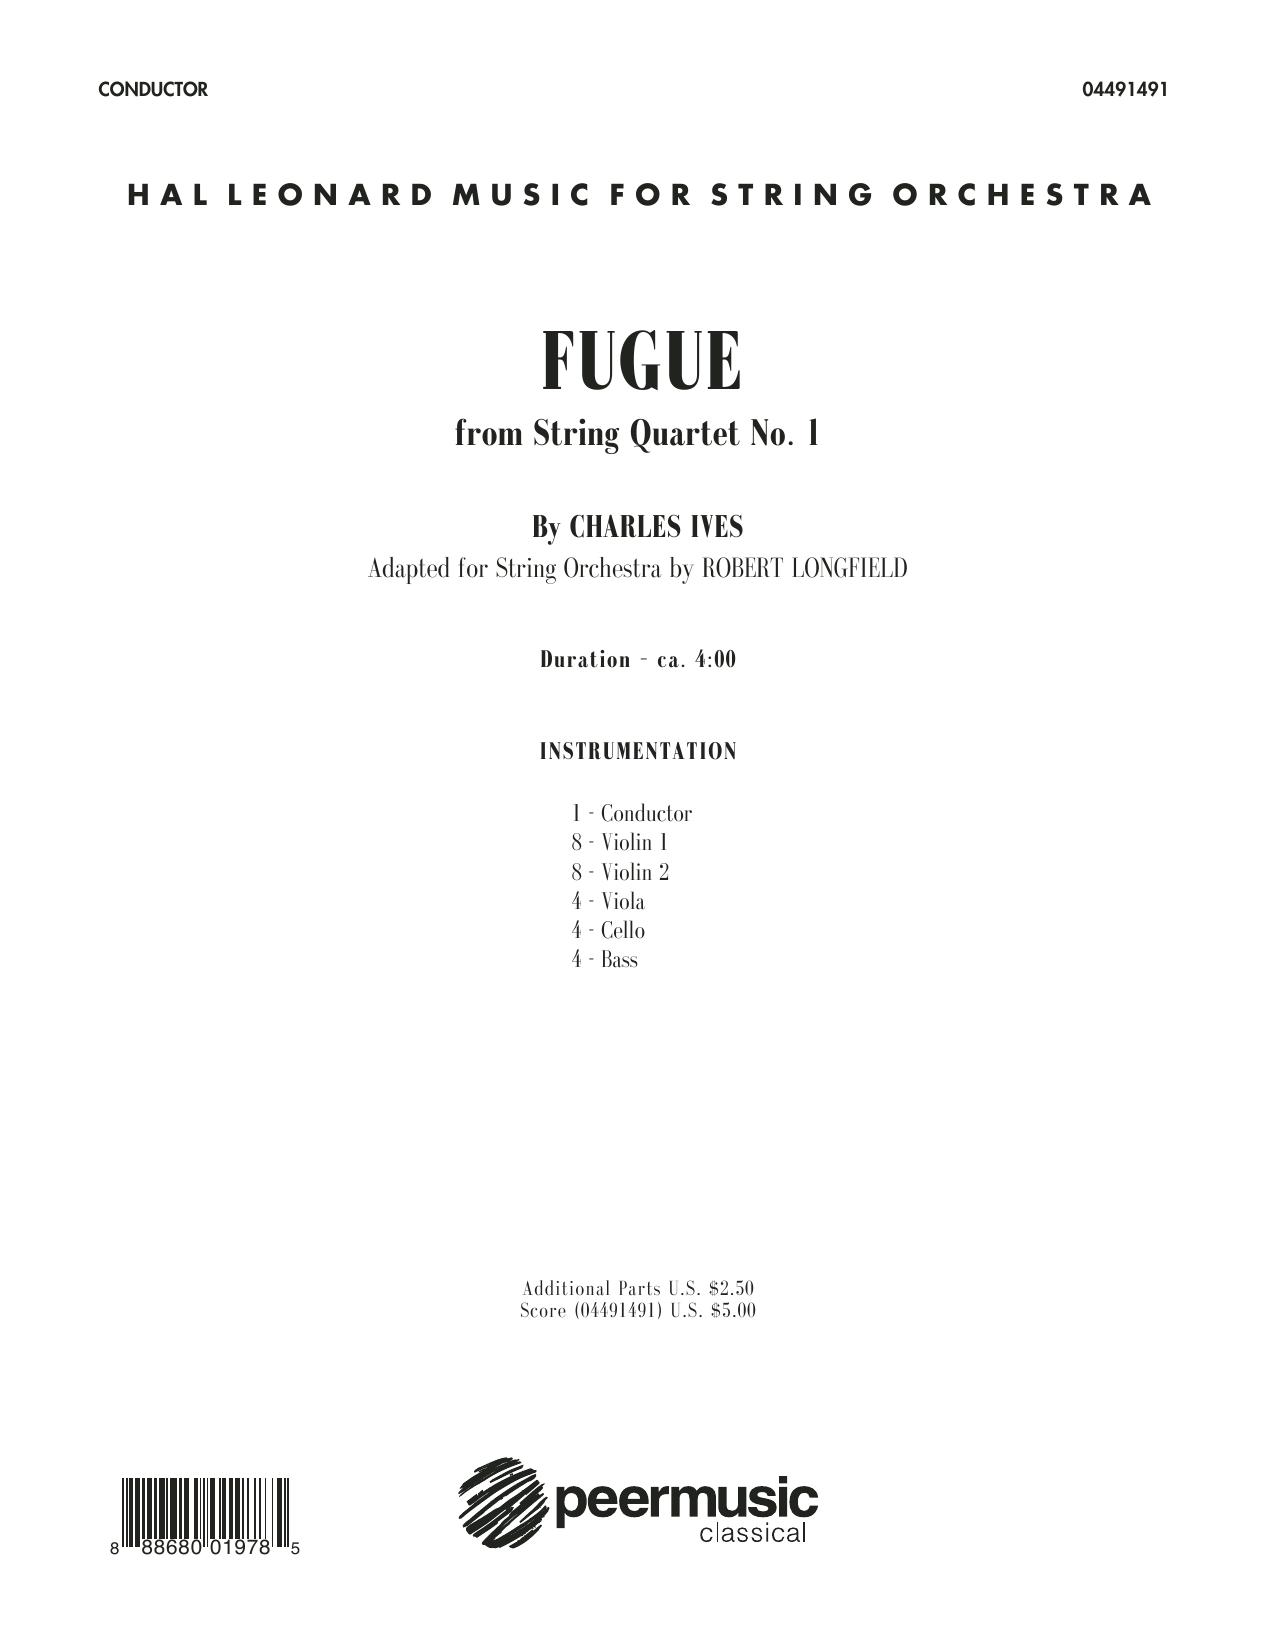 Robert Longfield Fugue from String Quartet No. 1 - Conductor Score (Full Score) sheet music notes printable PDF score